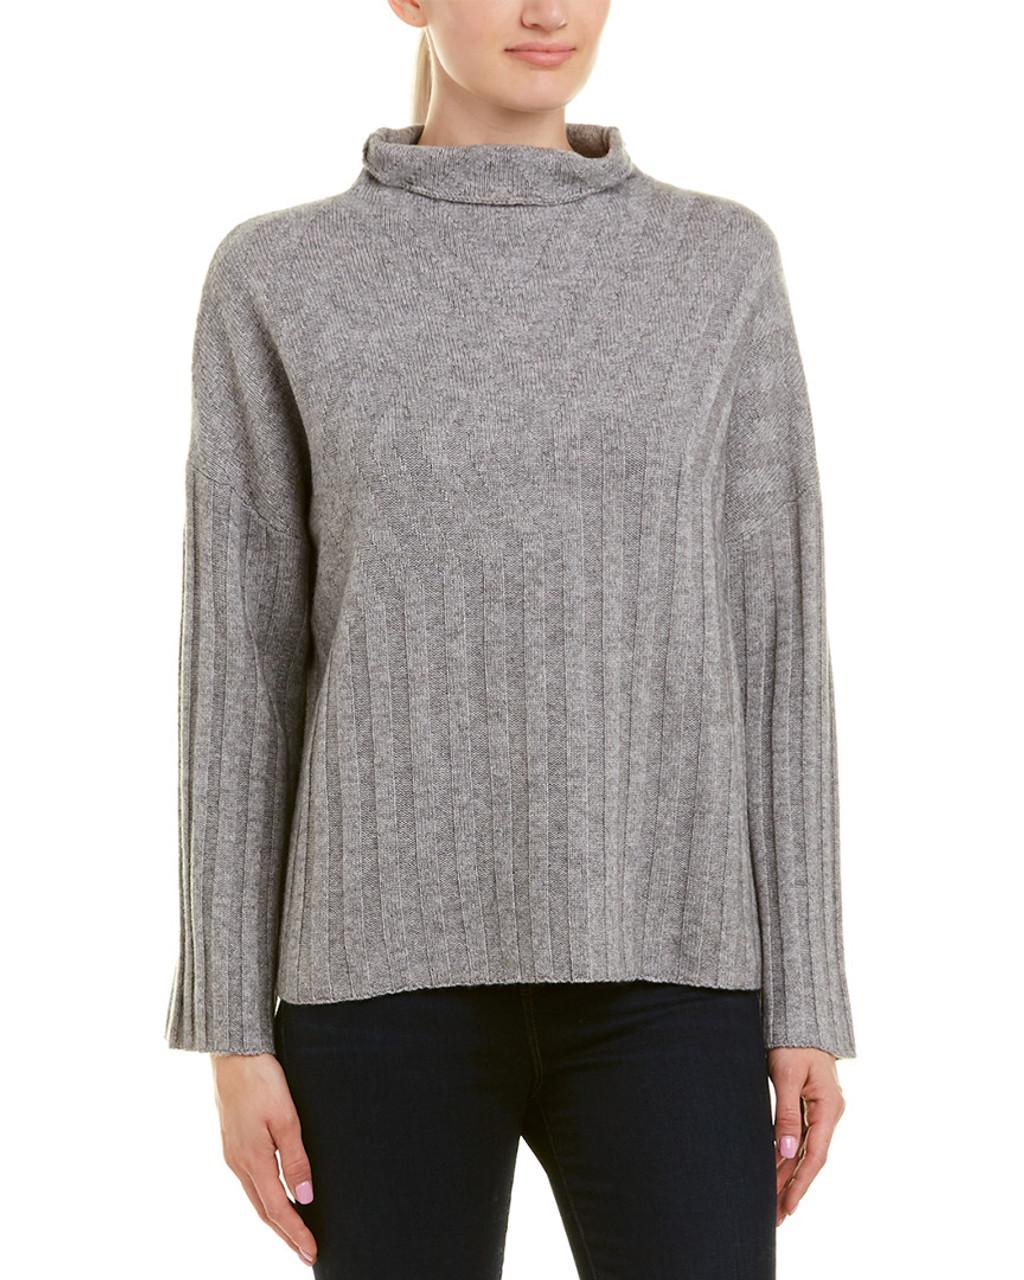 b6e4cb76 Qi Cashmere Textured Funnel Neck Wool & Cashmere-Blend Sweater ...